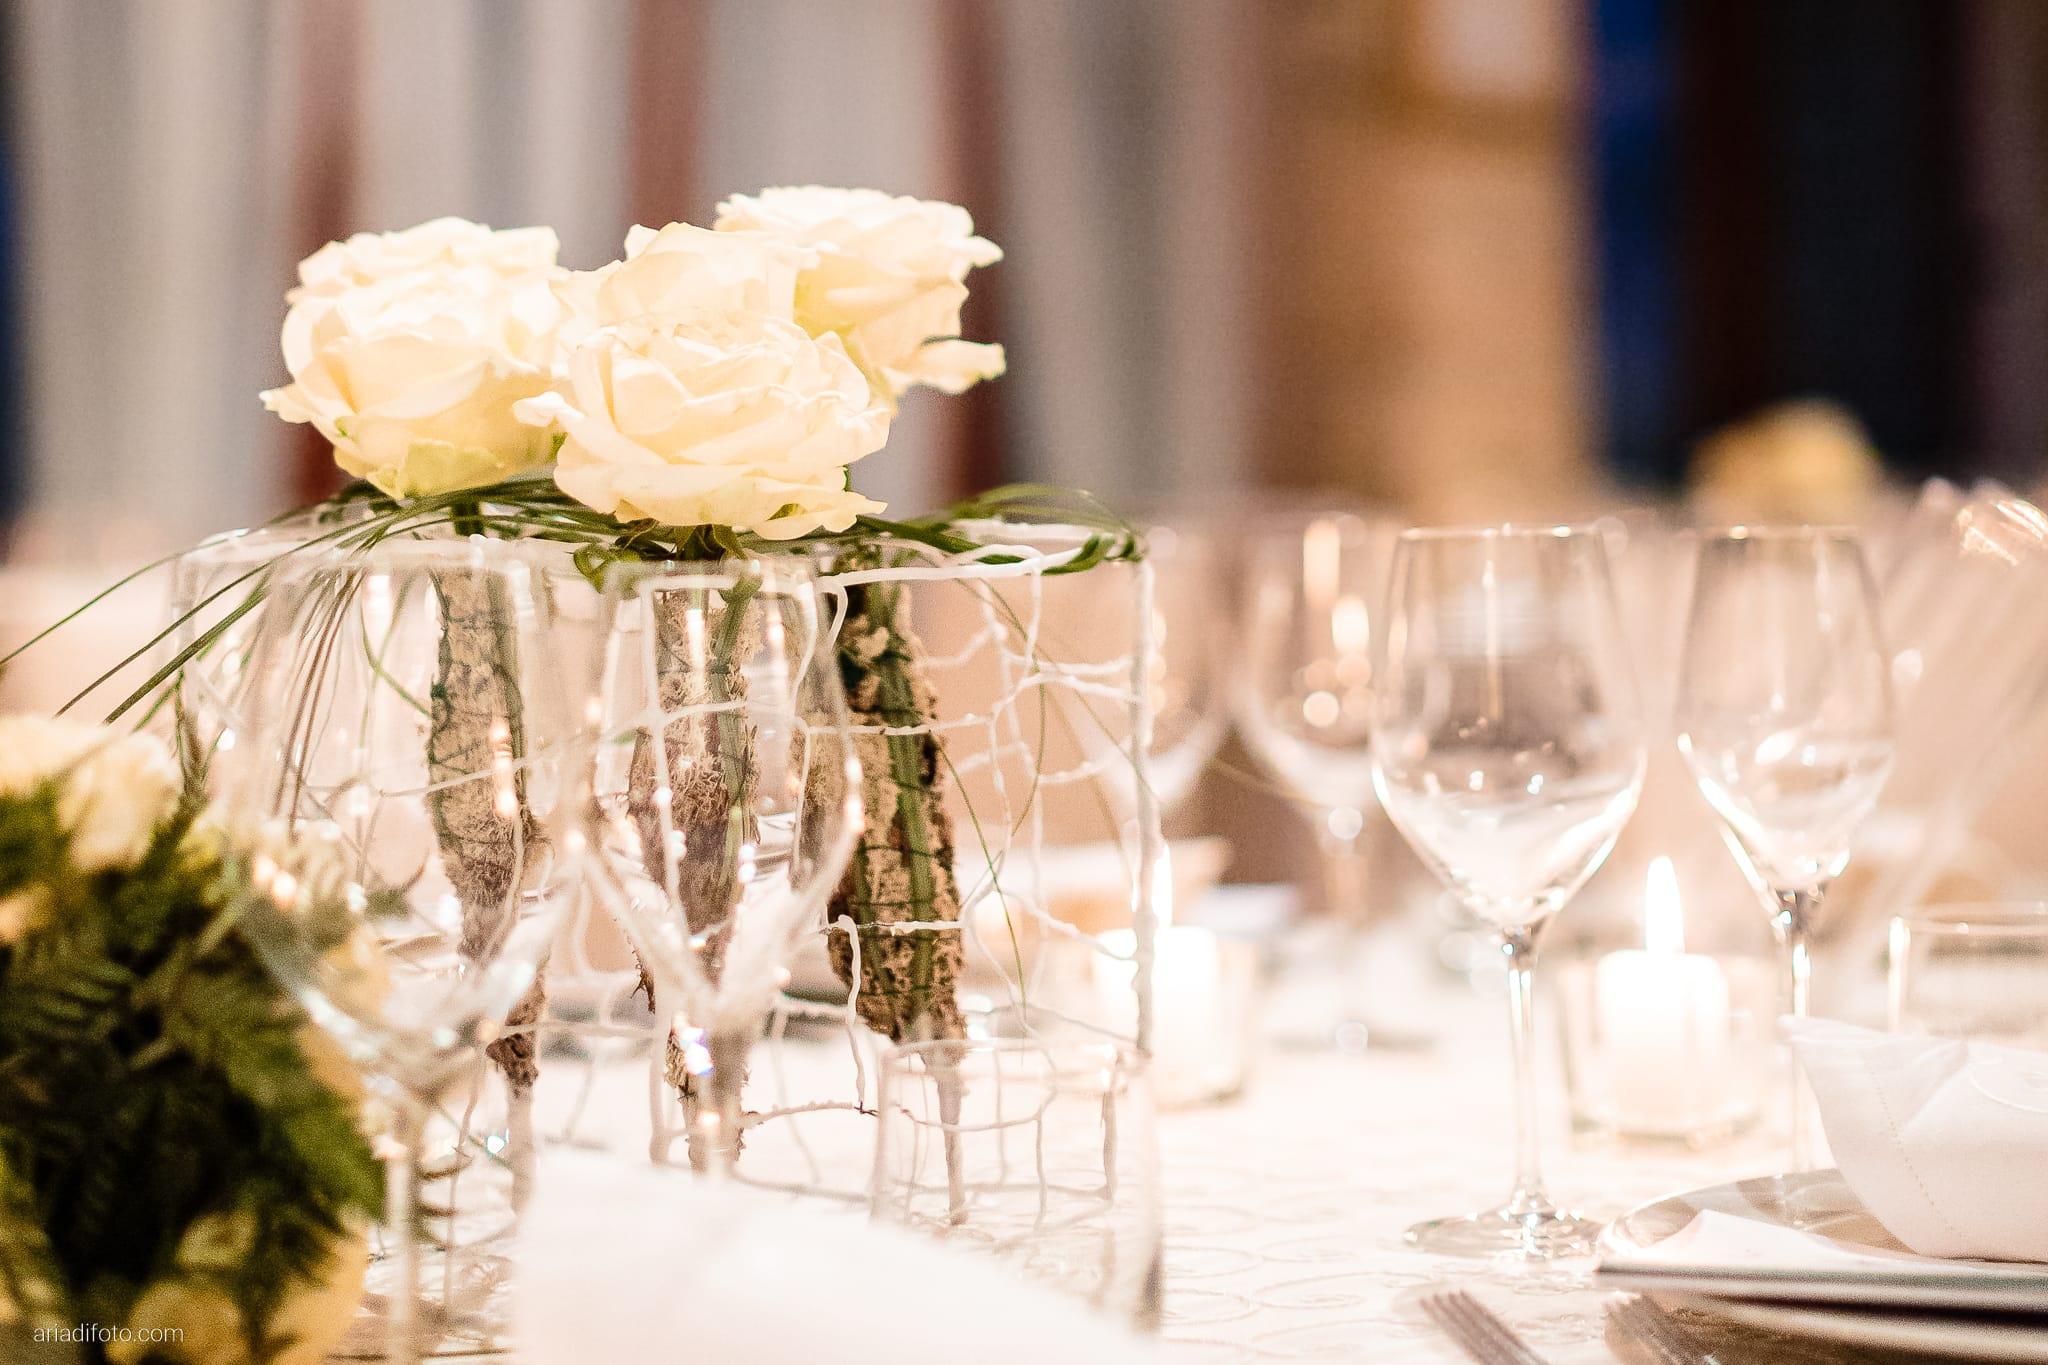 Elisa Matteo matrimonio Preval Gorizia Paradiso Pocenia Udine ricevimento dettagli sala decorazioni allestimenti tavoli fiori rose